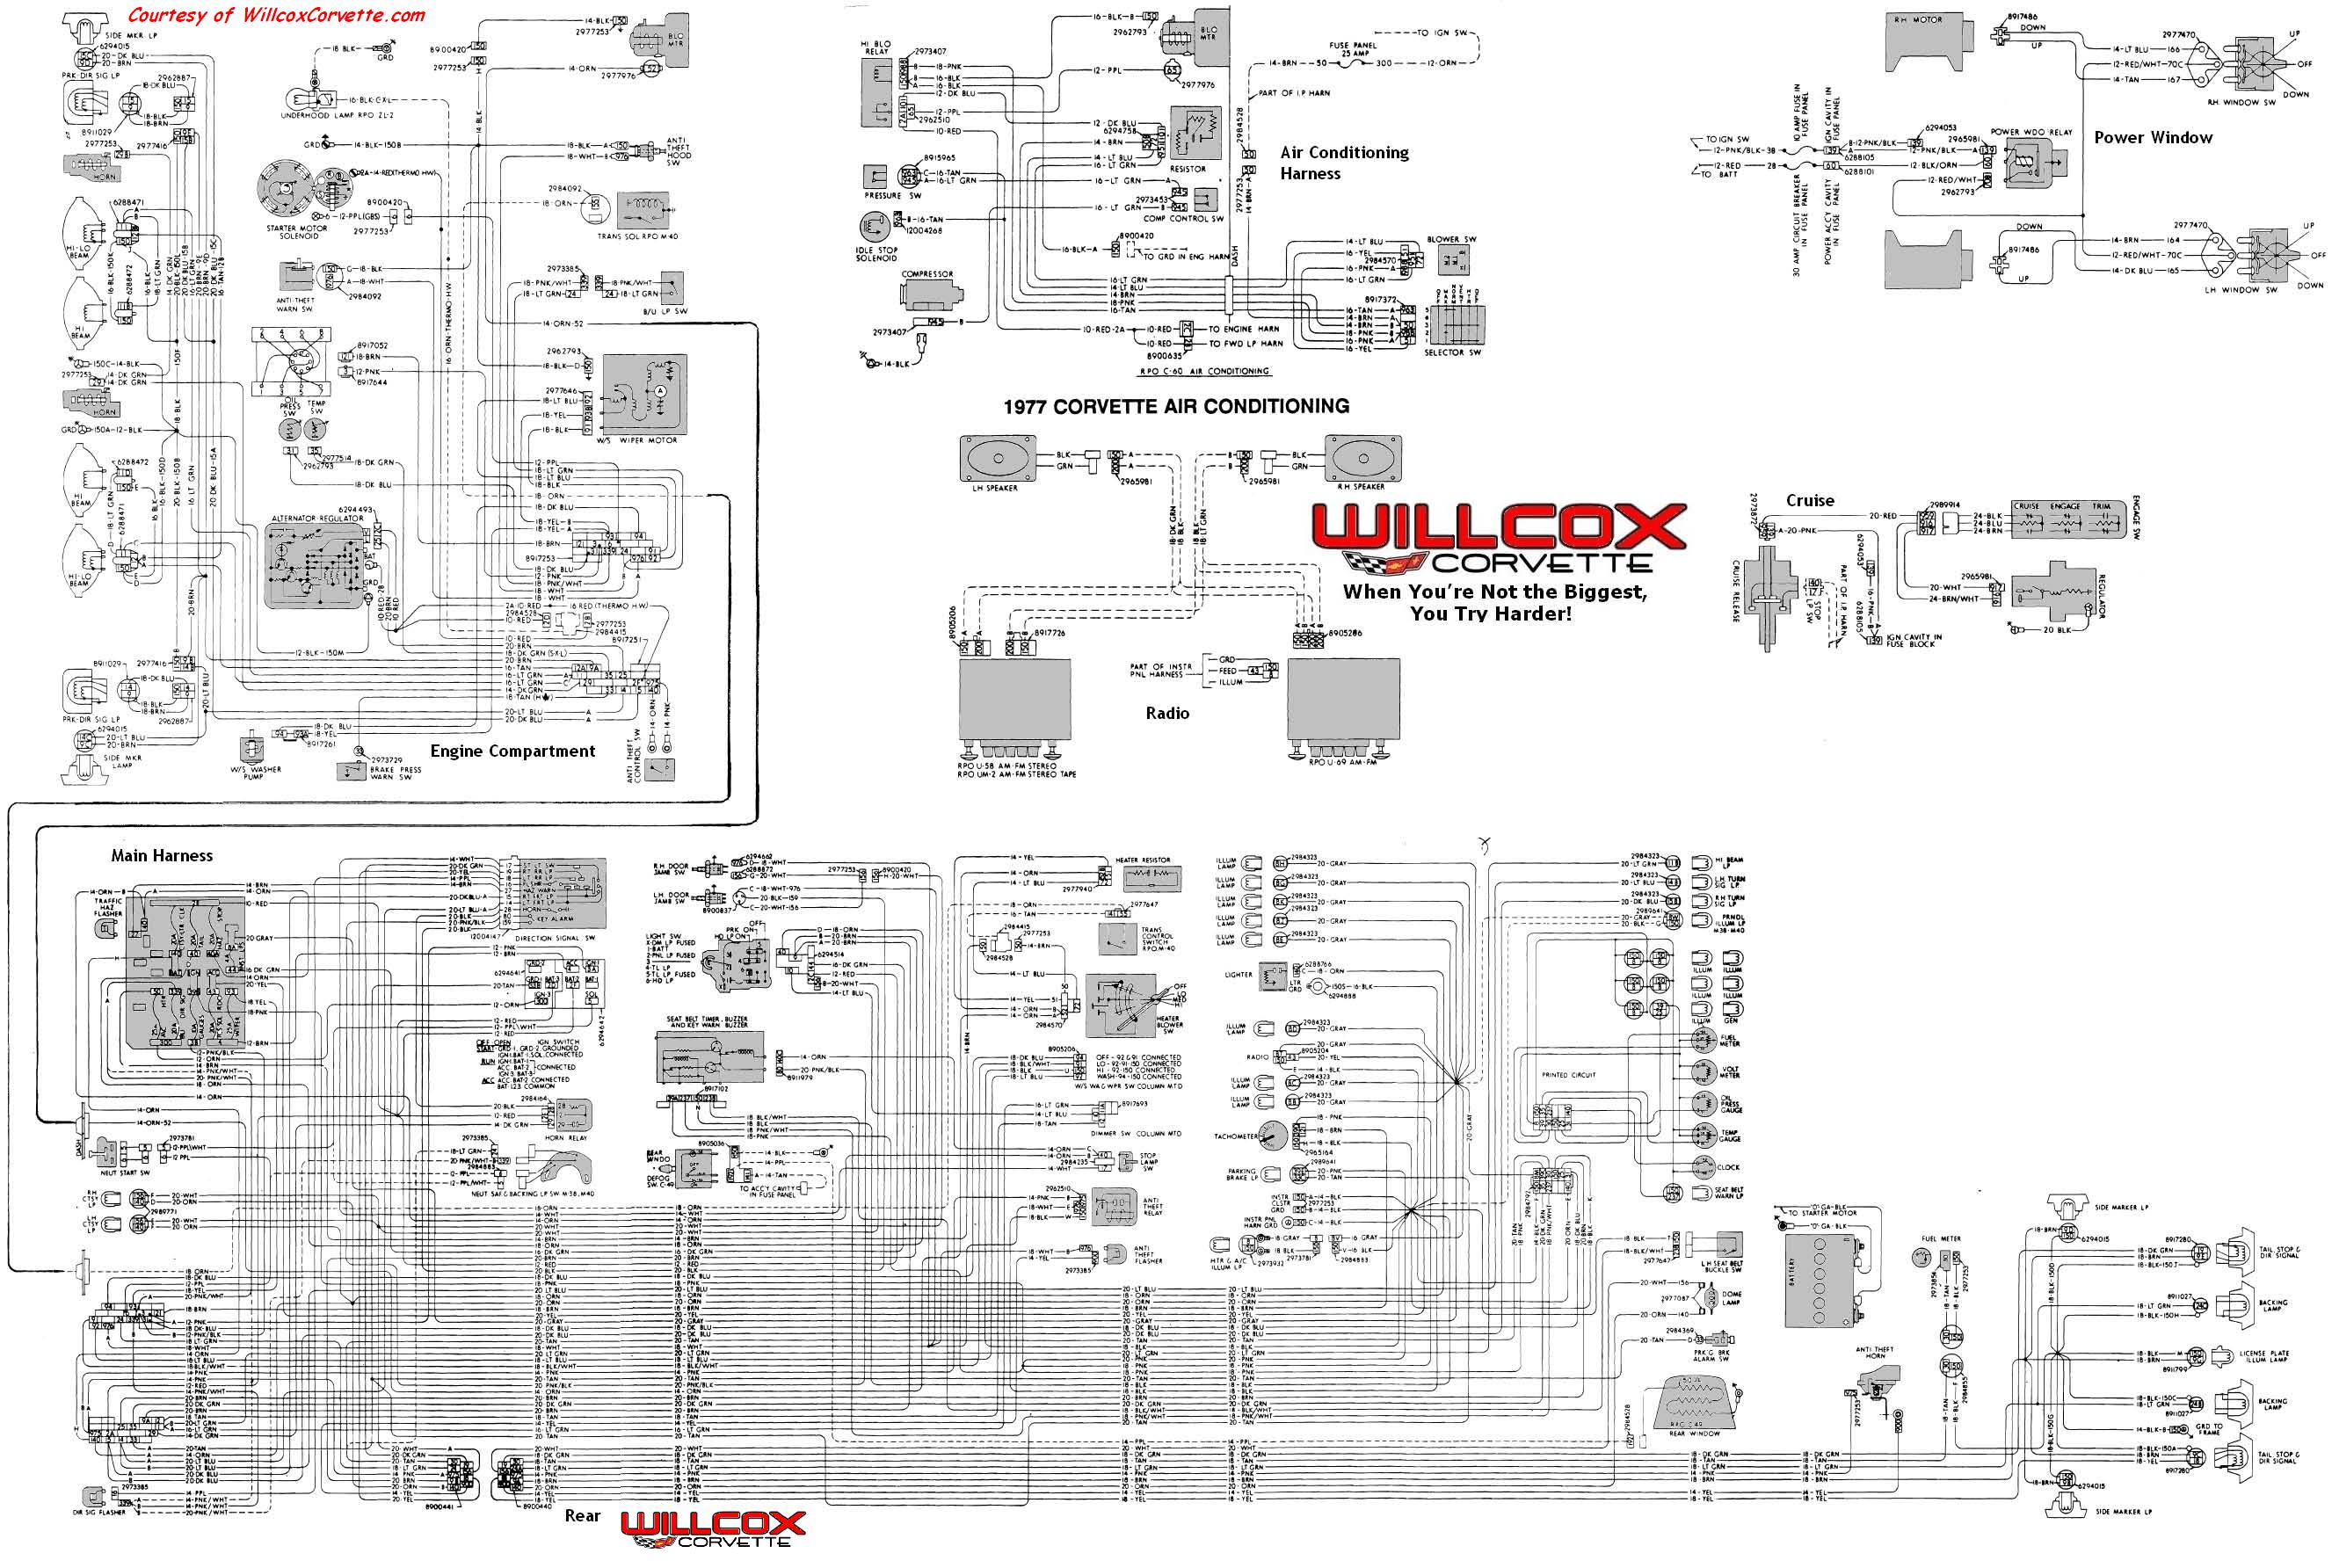 cj7 dash wiring diagram 1983 jeep cj7 wiring diagram wiring diagram data  1983 jeep cj7 wiring diagram wiring